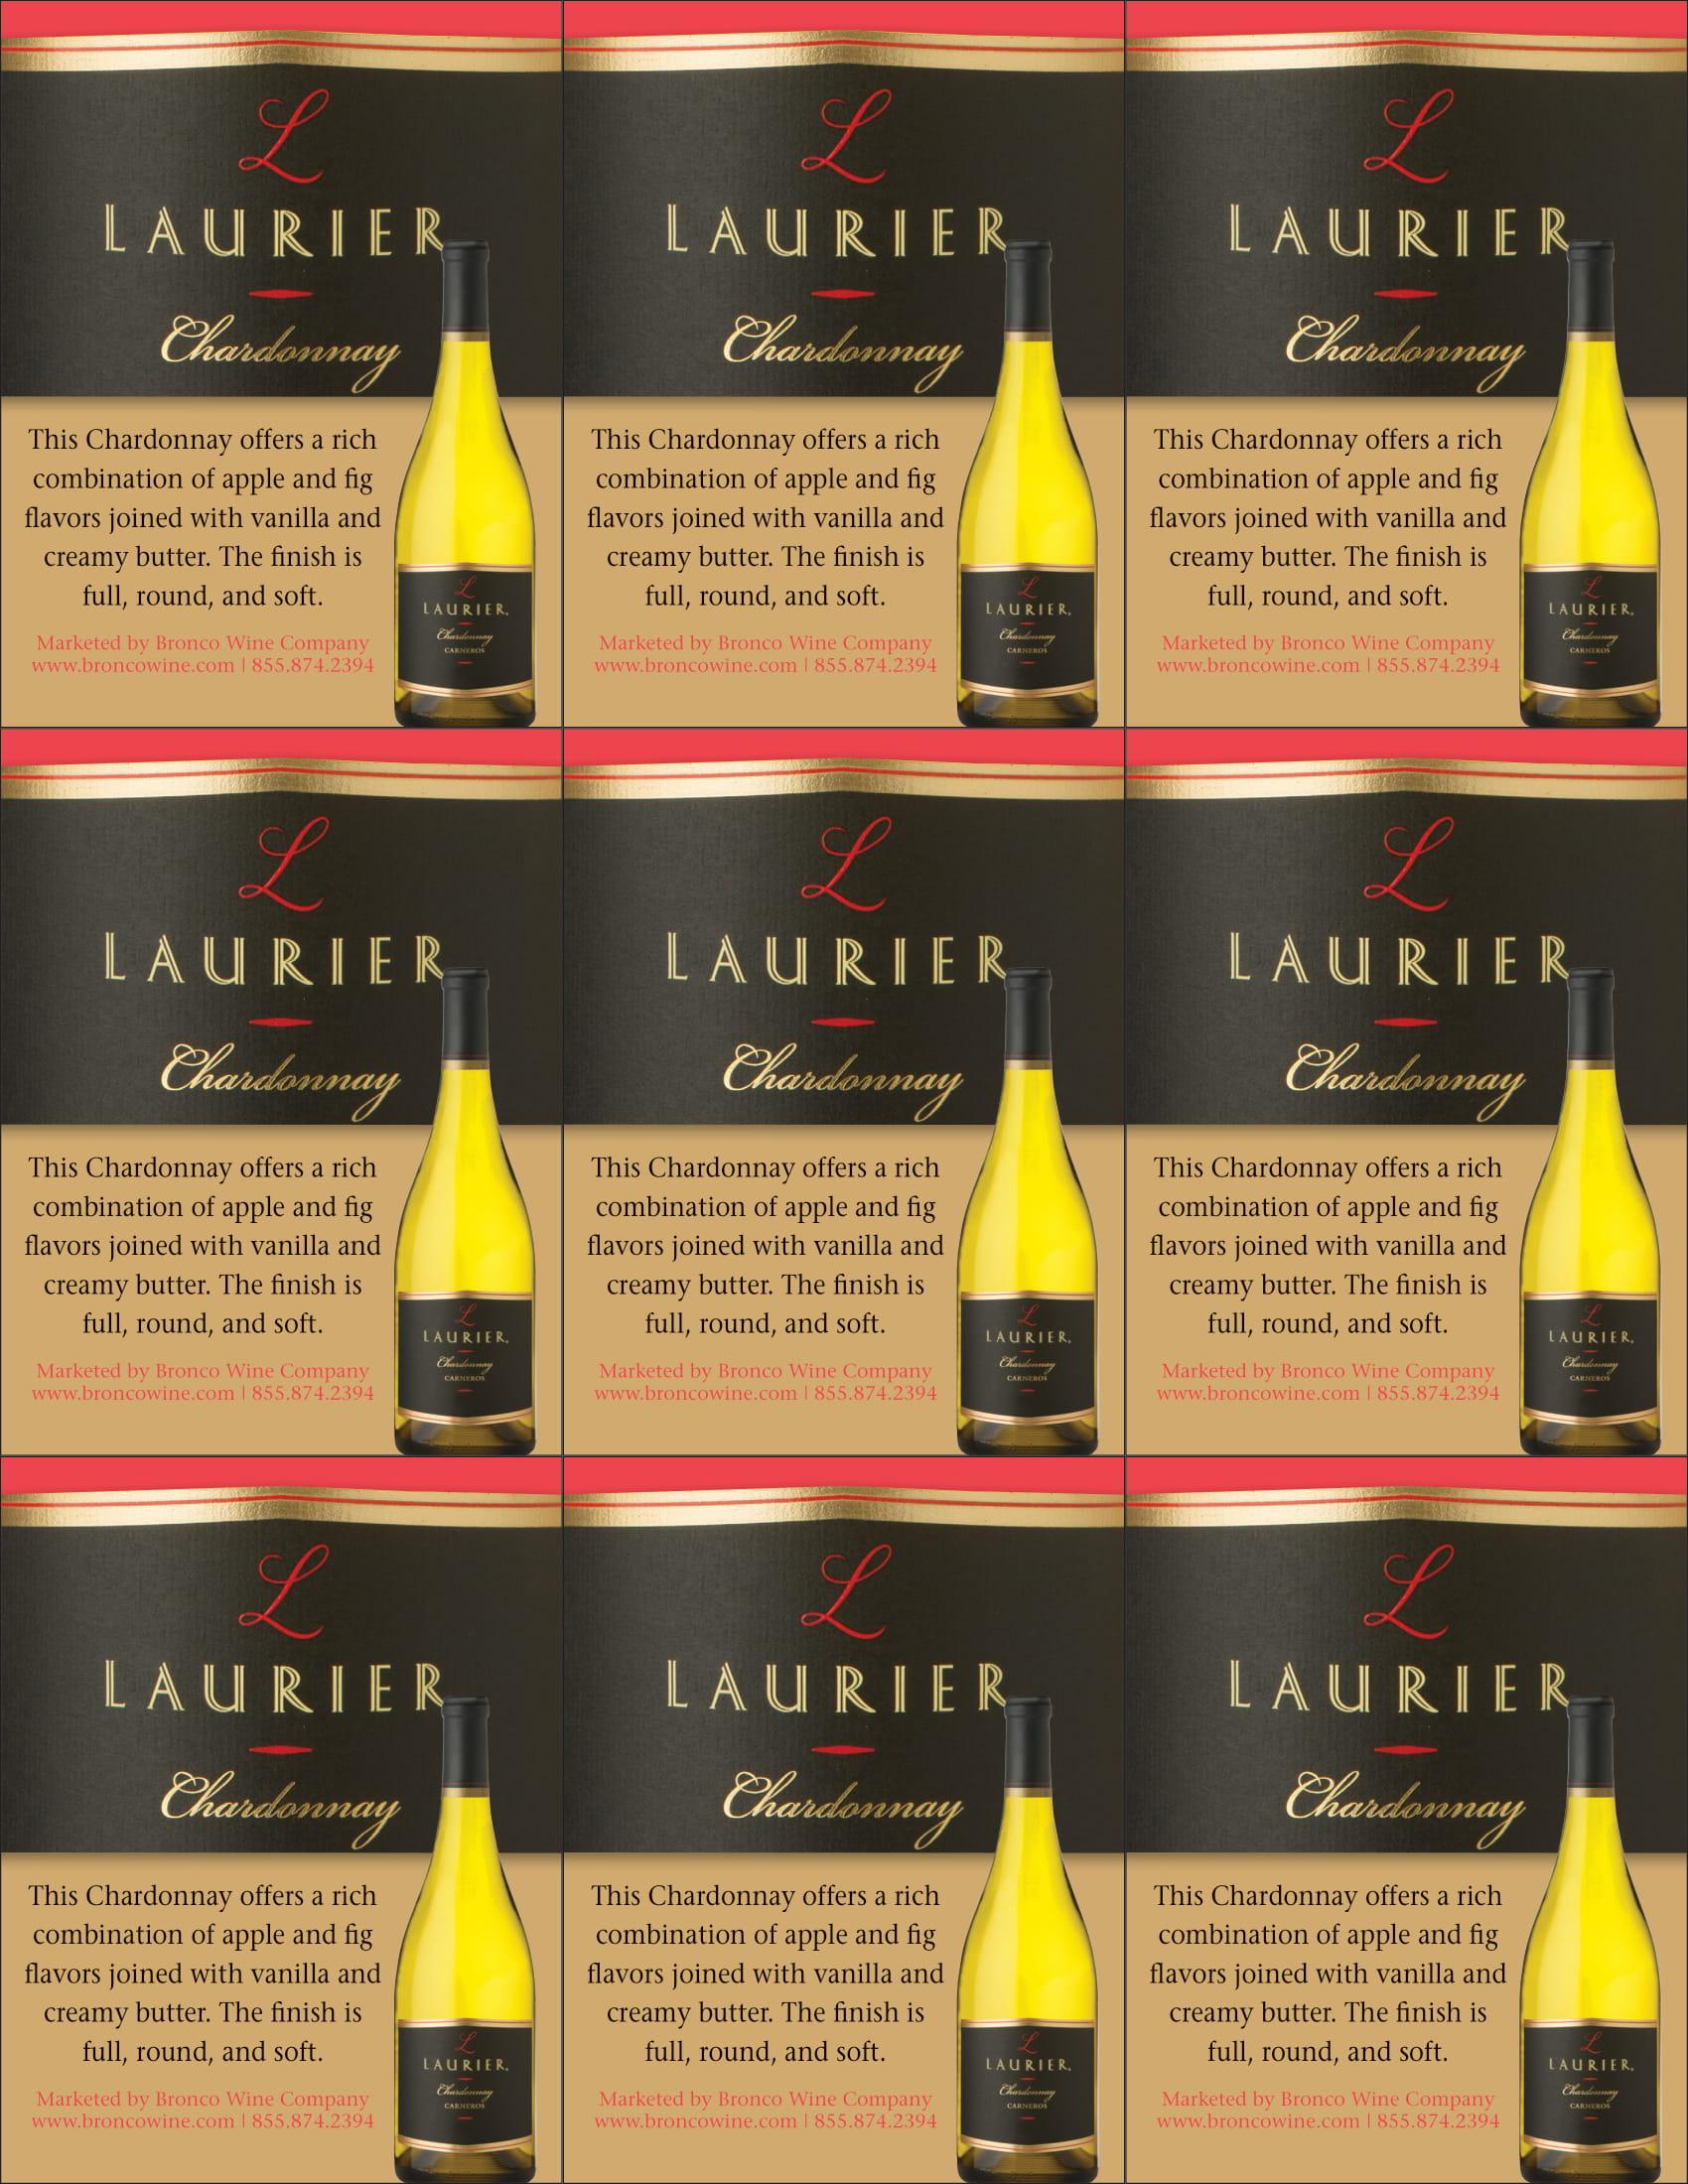 Laurier Chardonnay Shelf Talker